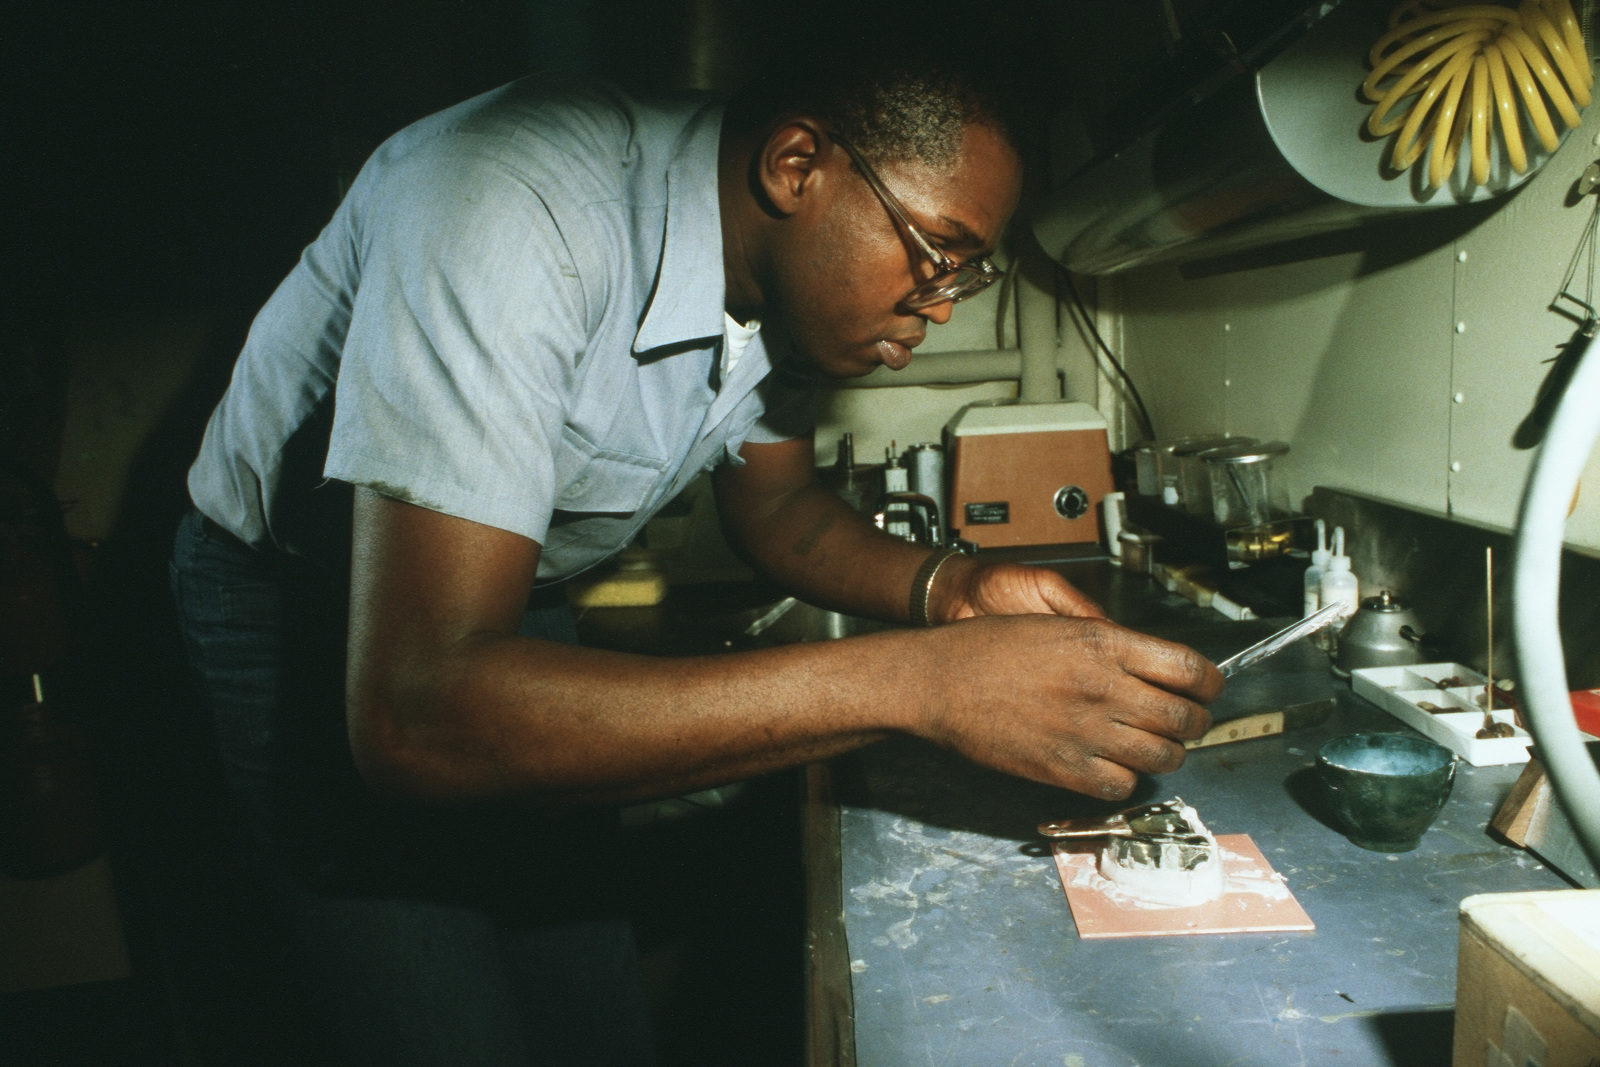 Dental Technician 1ST Class (DT1) George Allen pours an impression mold in the dental department of the battleship USS MISSOURI (BB 63)